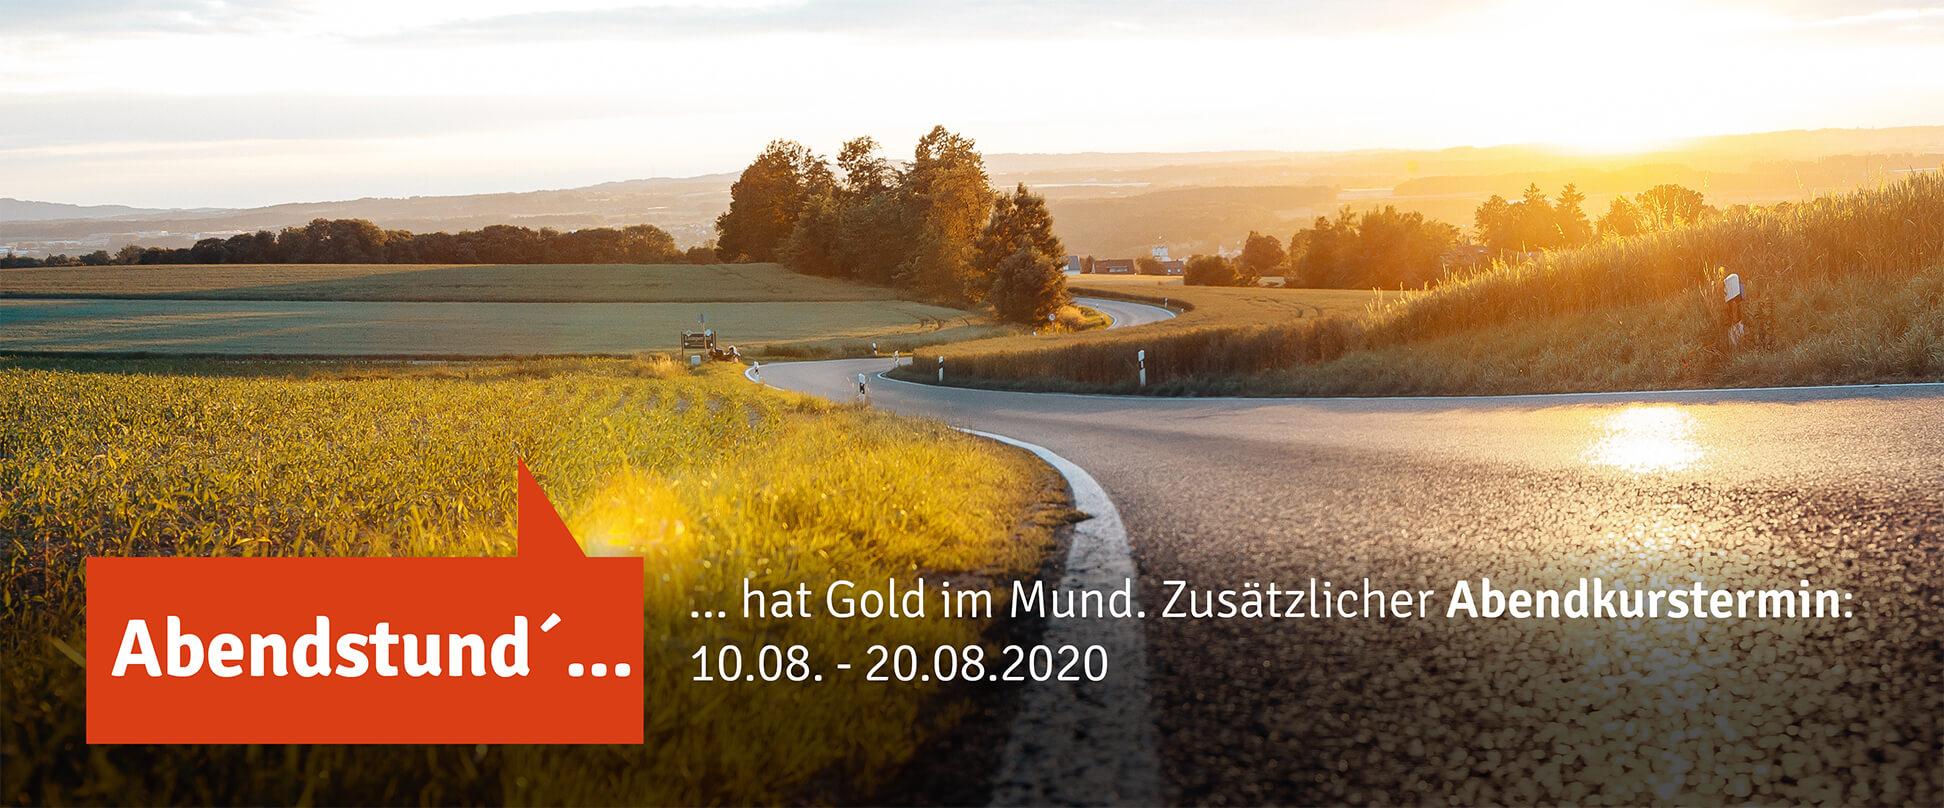 Slider_Abendkurs20-08